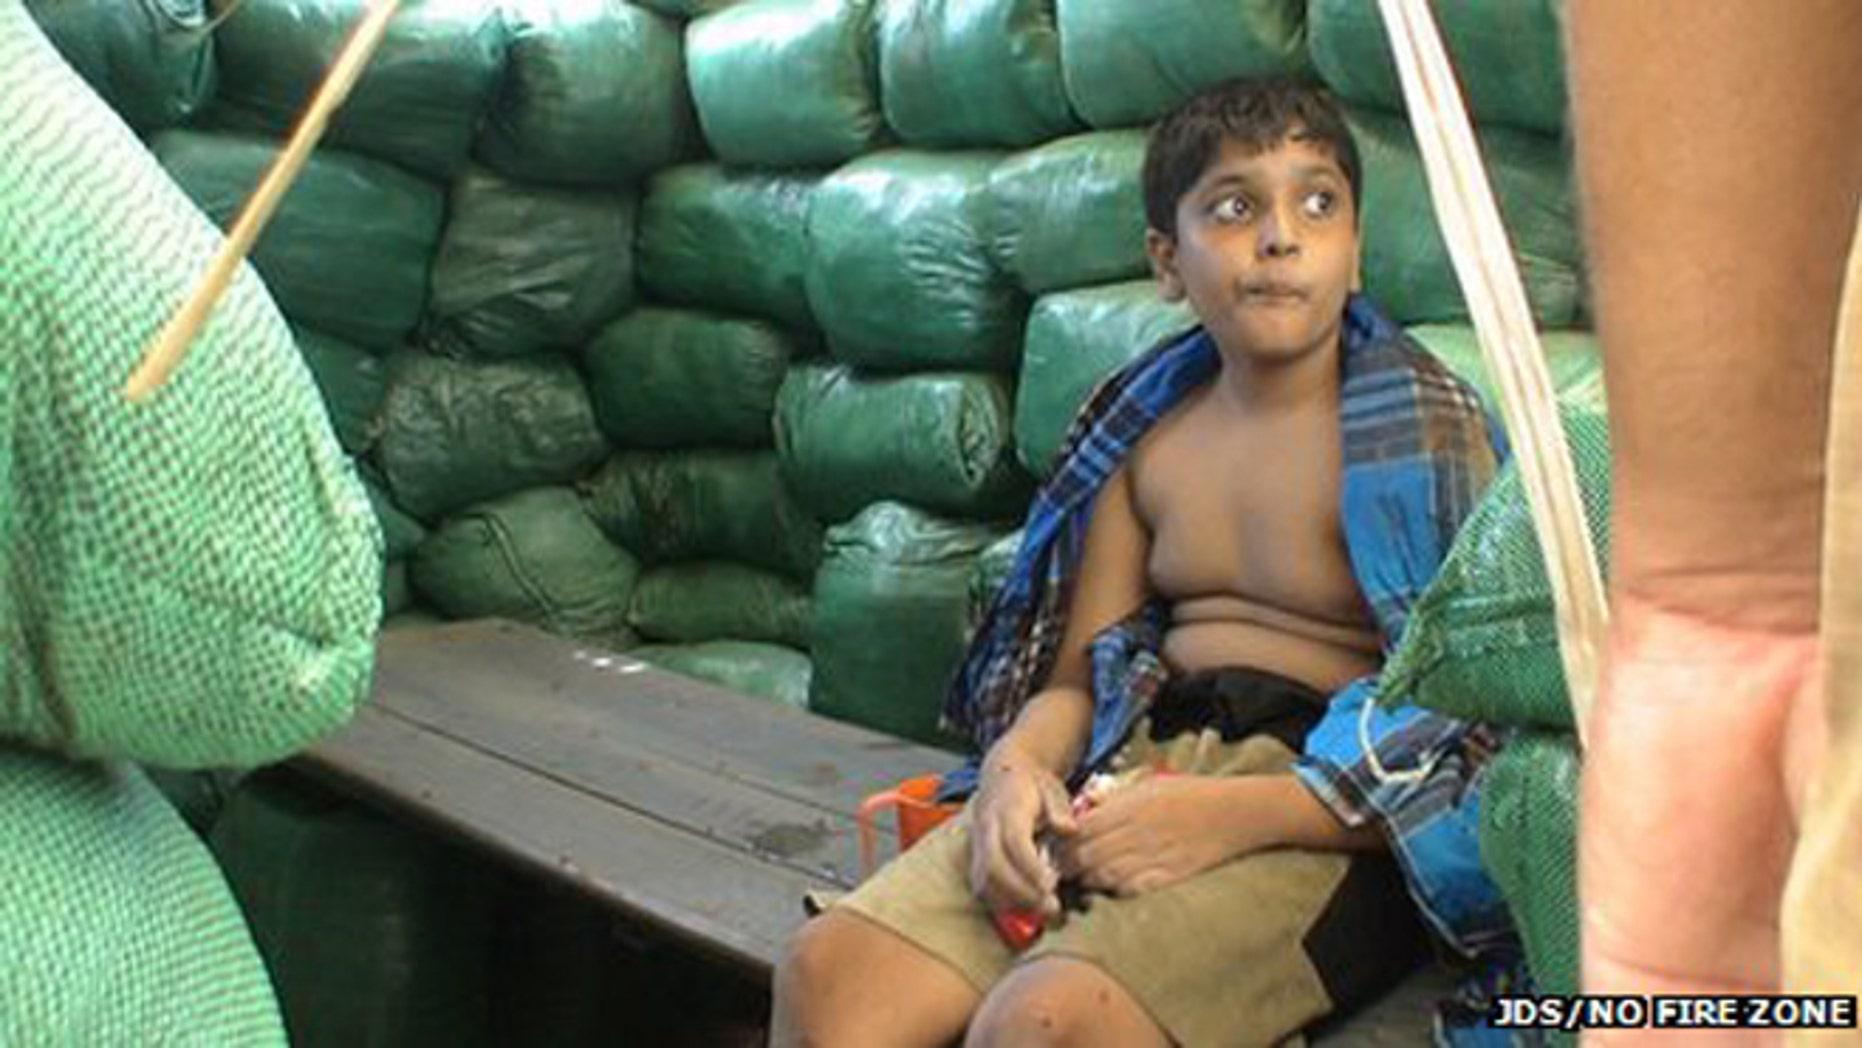 Balachandran Prabhakaran, shown eating chocolate while sitting on a bench.